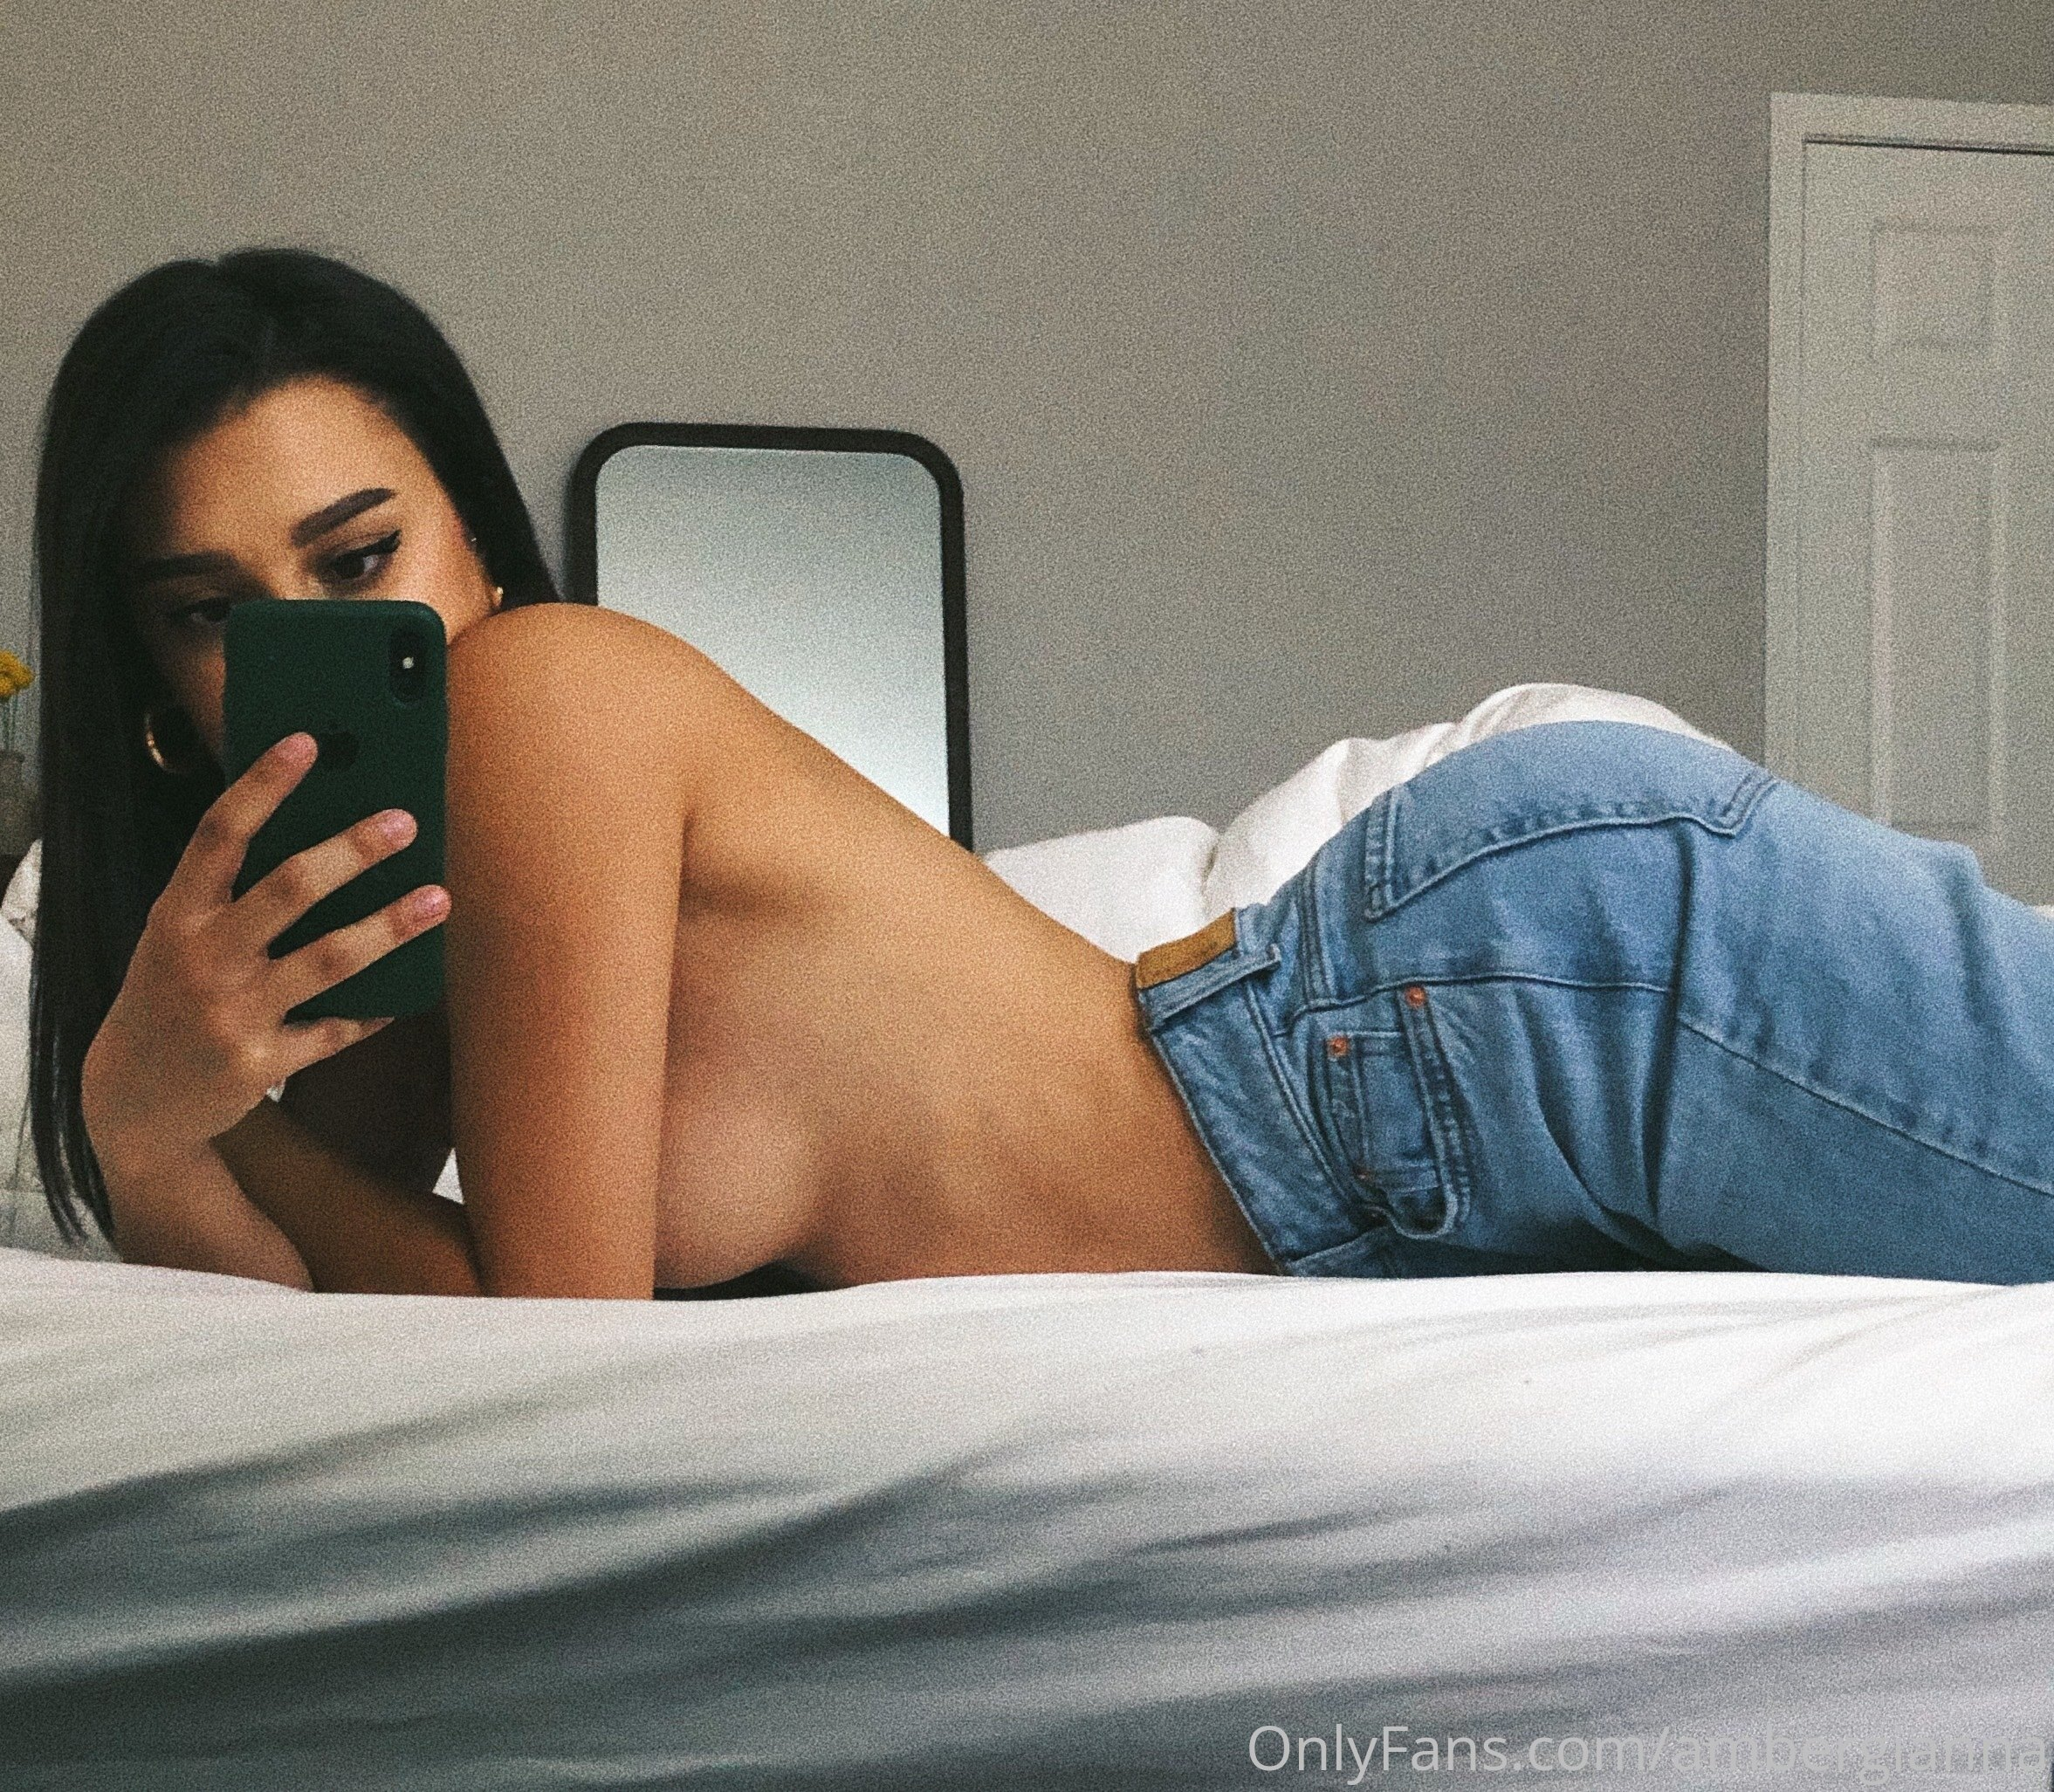 Amber Gianna Onlyfans 0119